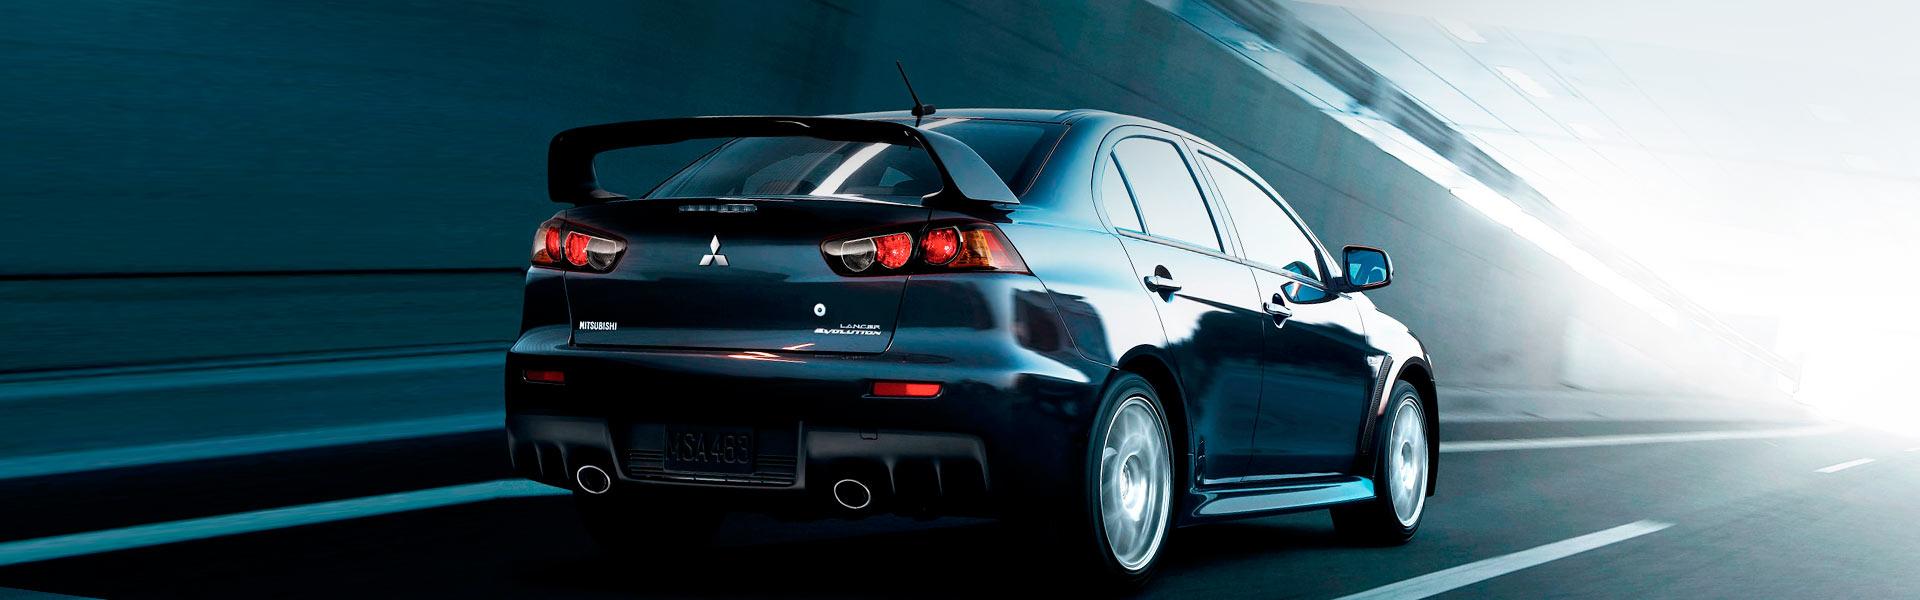 Наконечник рулевой тяги на Mitsubishi